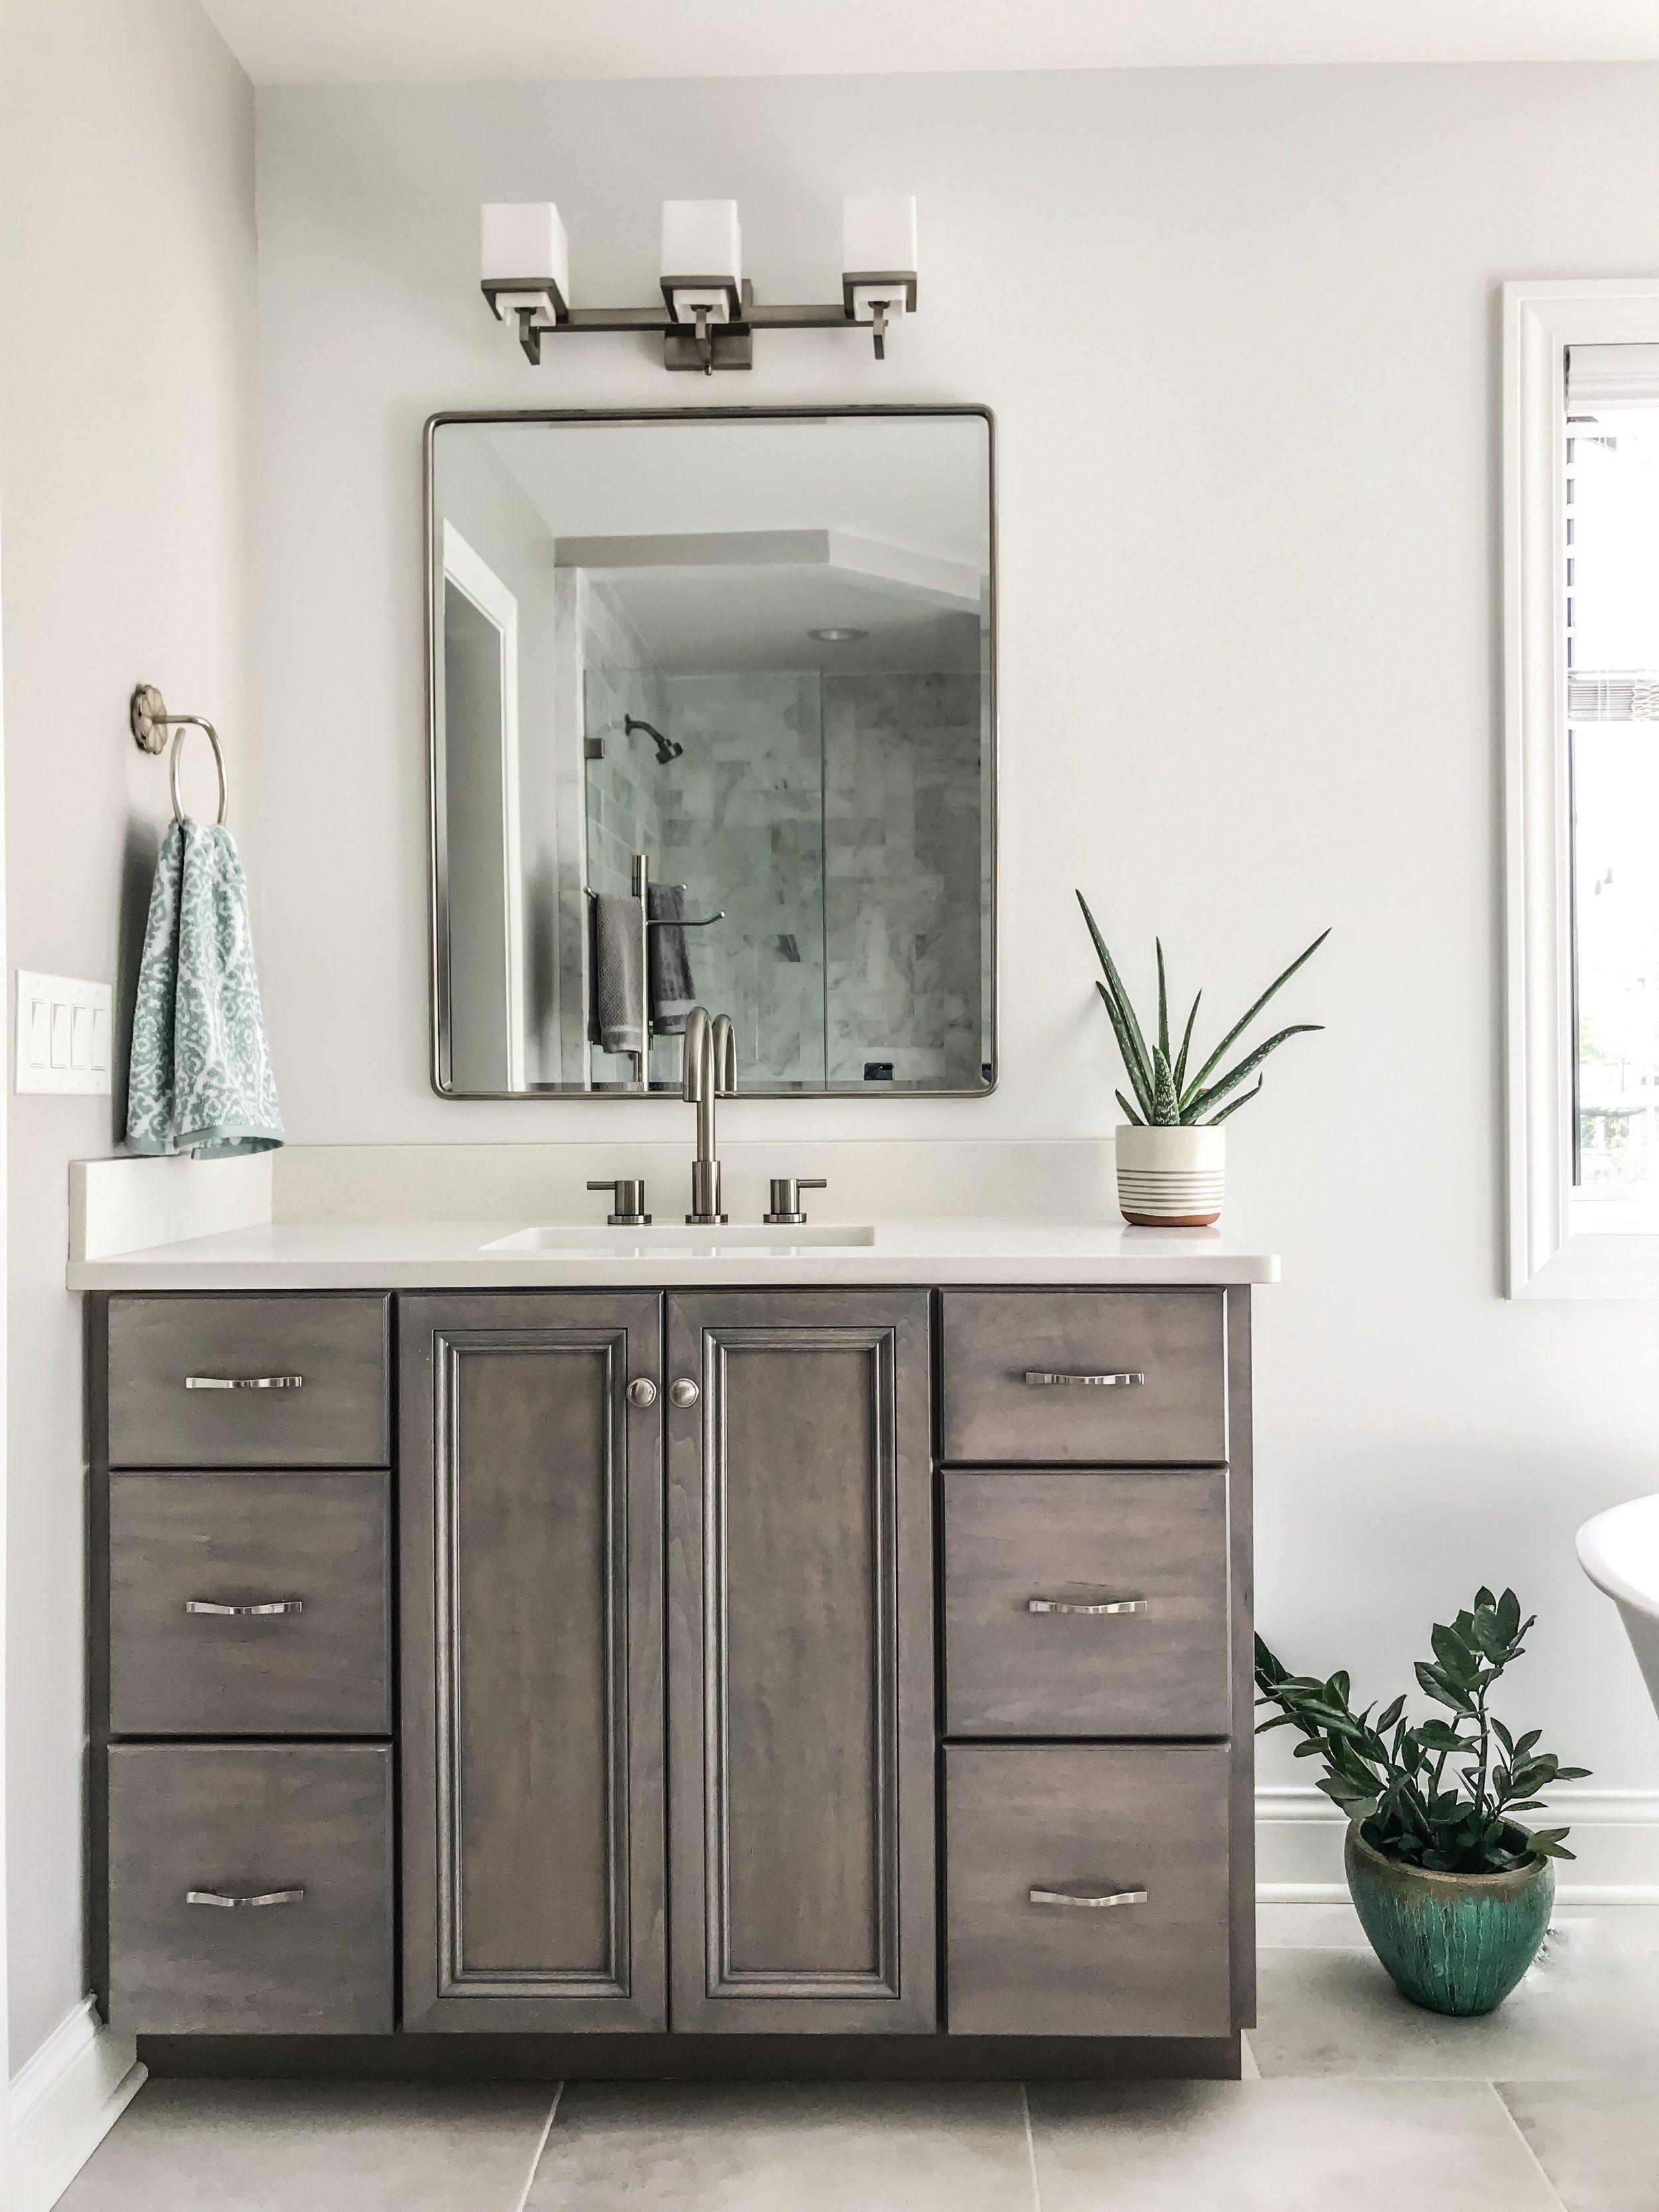 Avoid These Two Major Mistakes When Buying Bathroom Vanity Mirrors Bathroomdesignmistakes Gray Bathroom Decor